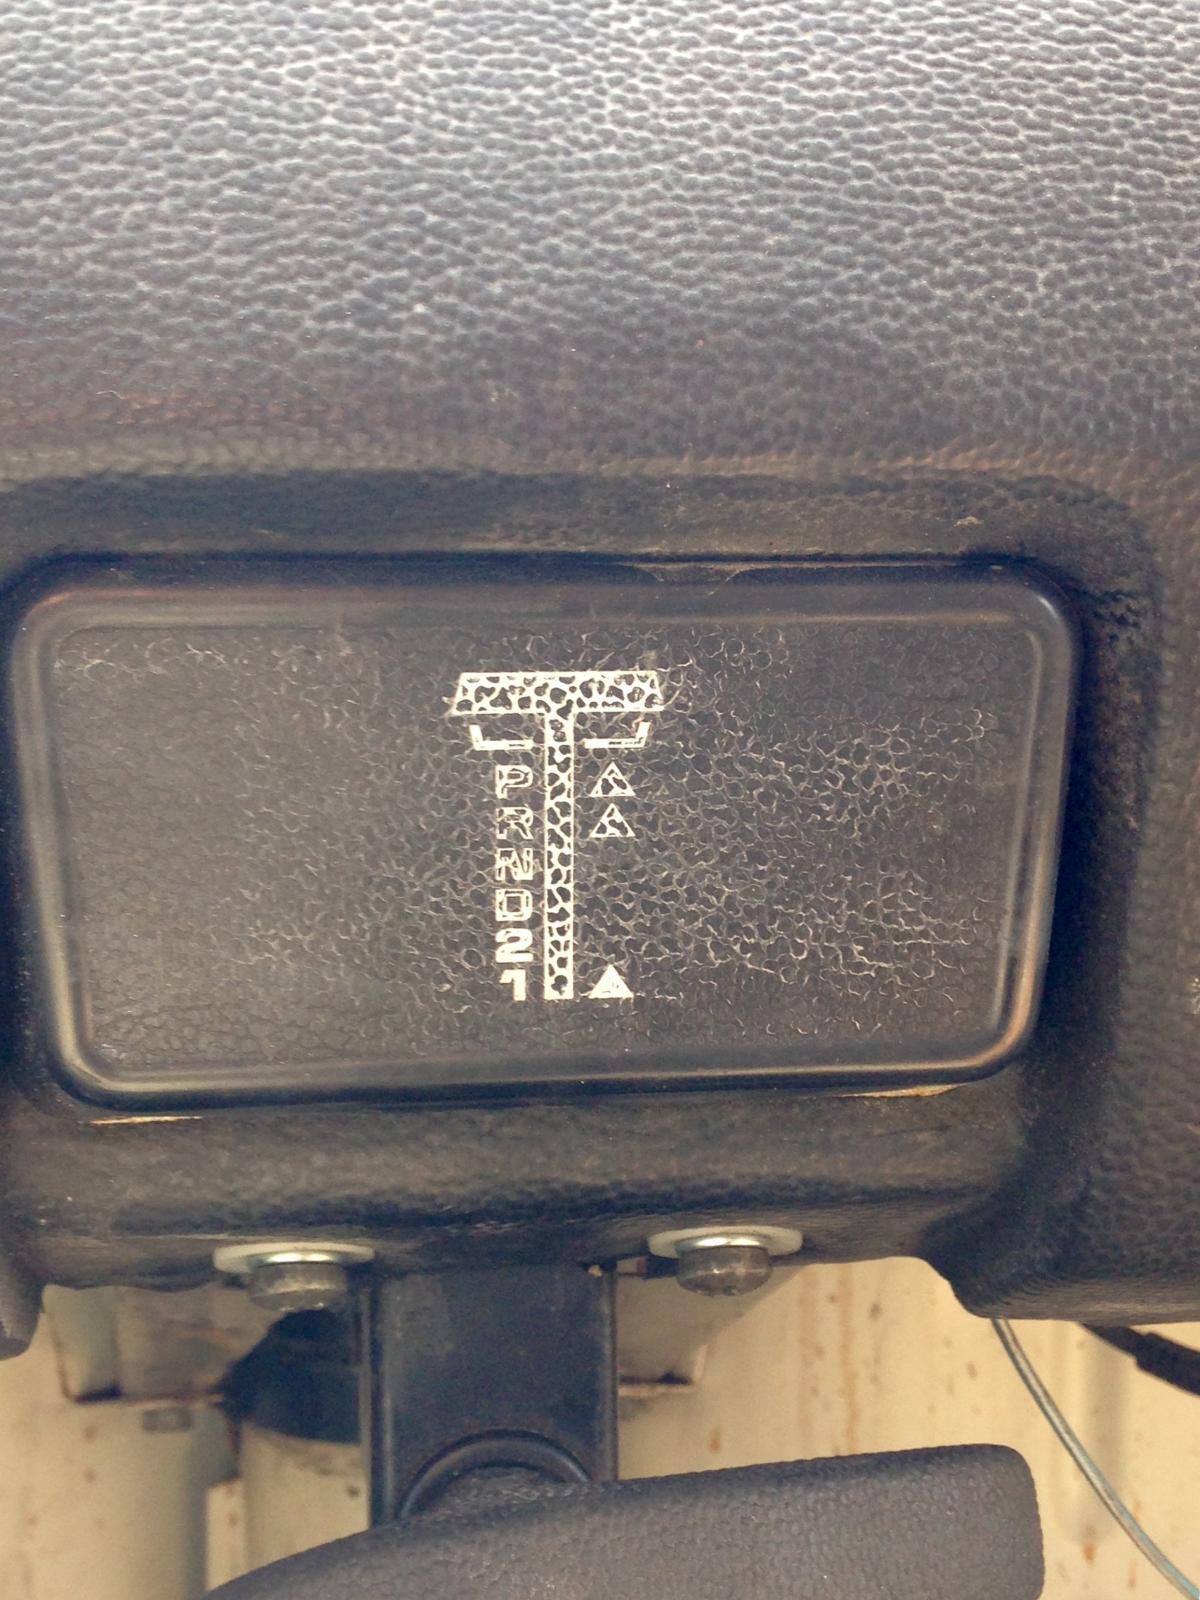 1973 automatic transmission print ashtray